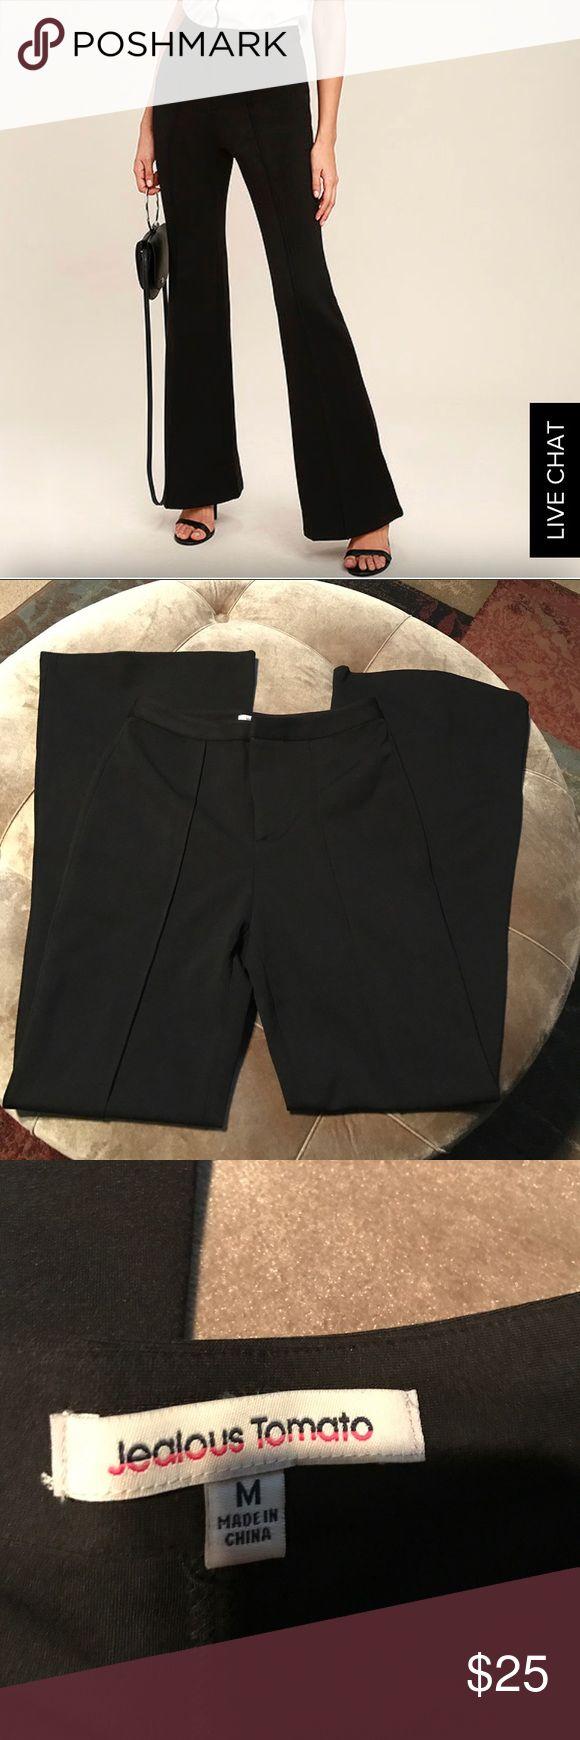 Lulus flare black pants size Medium NEW New Never Worn/ black Career flare pants size Medium lulus brand Lulu's Pants Boot Cut & Flare